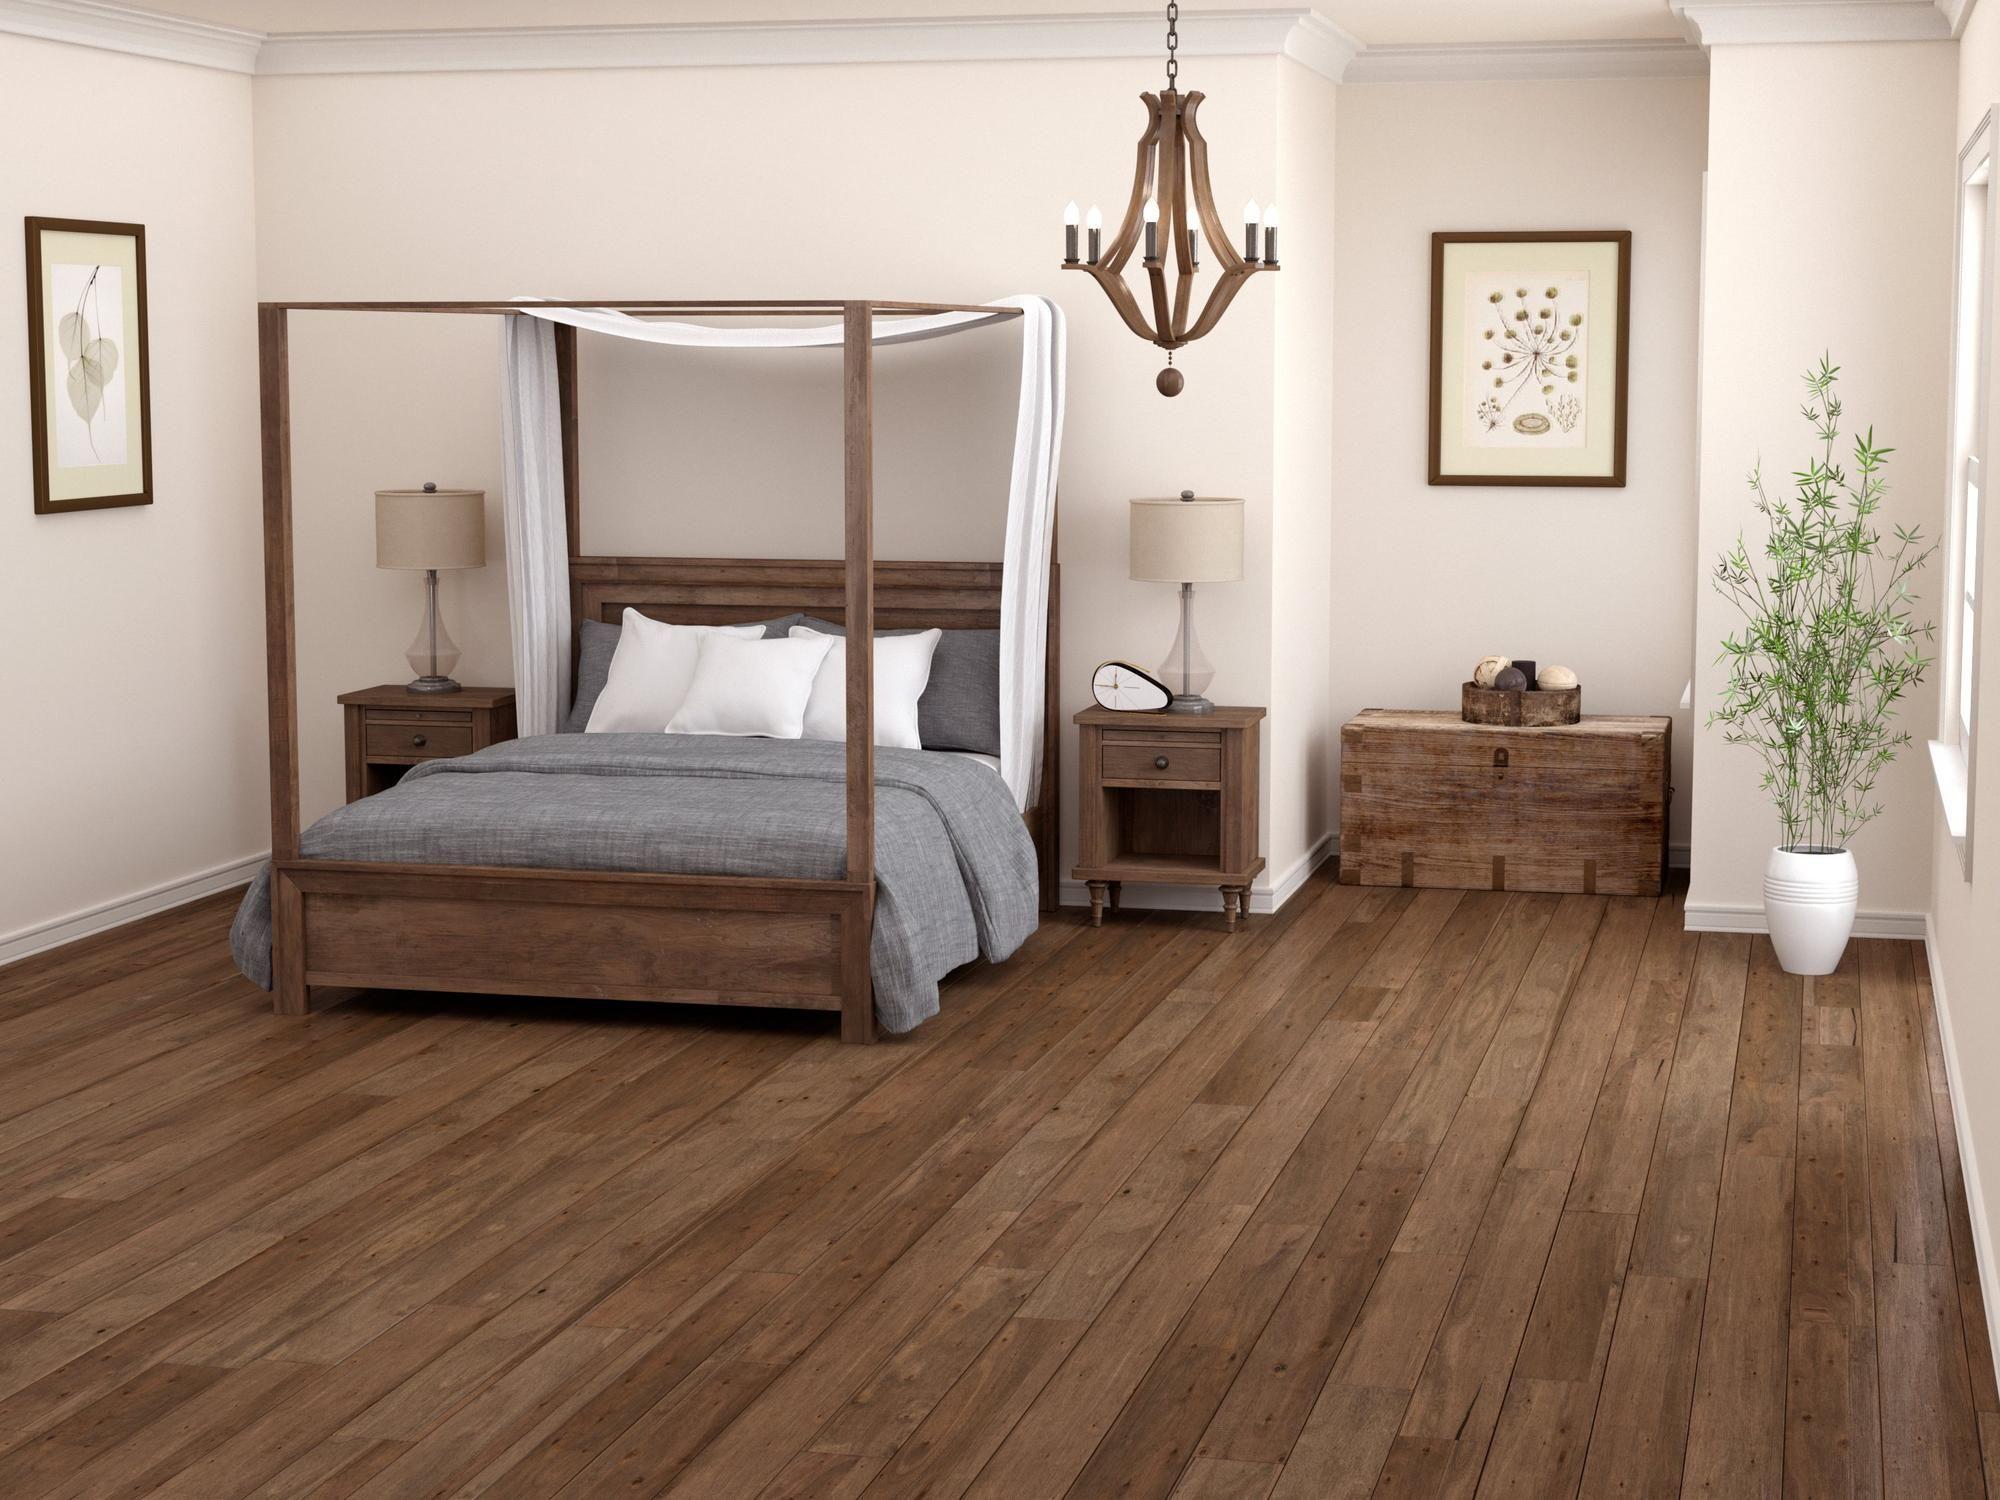 Driftwood lyptus hand scraped engineered hardwood floor